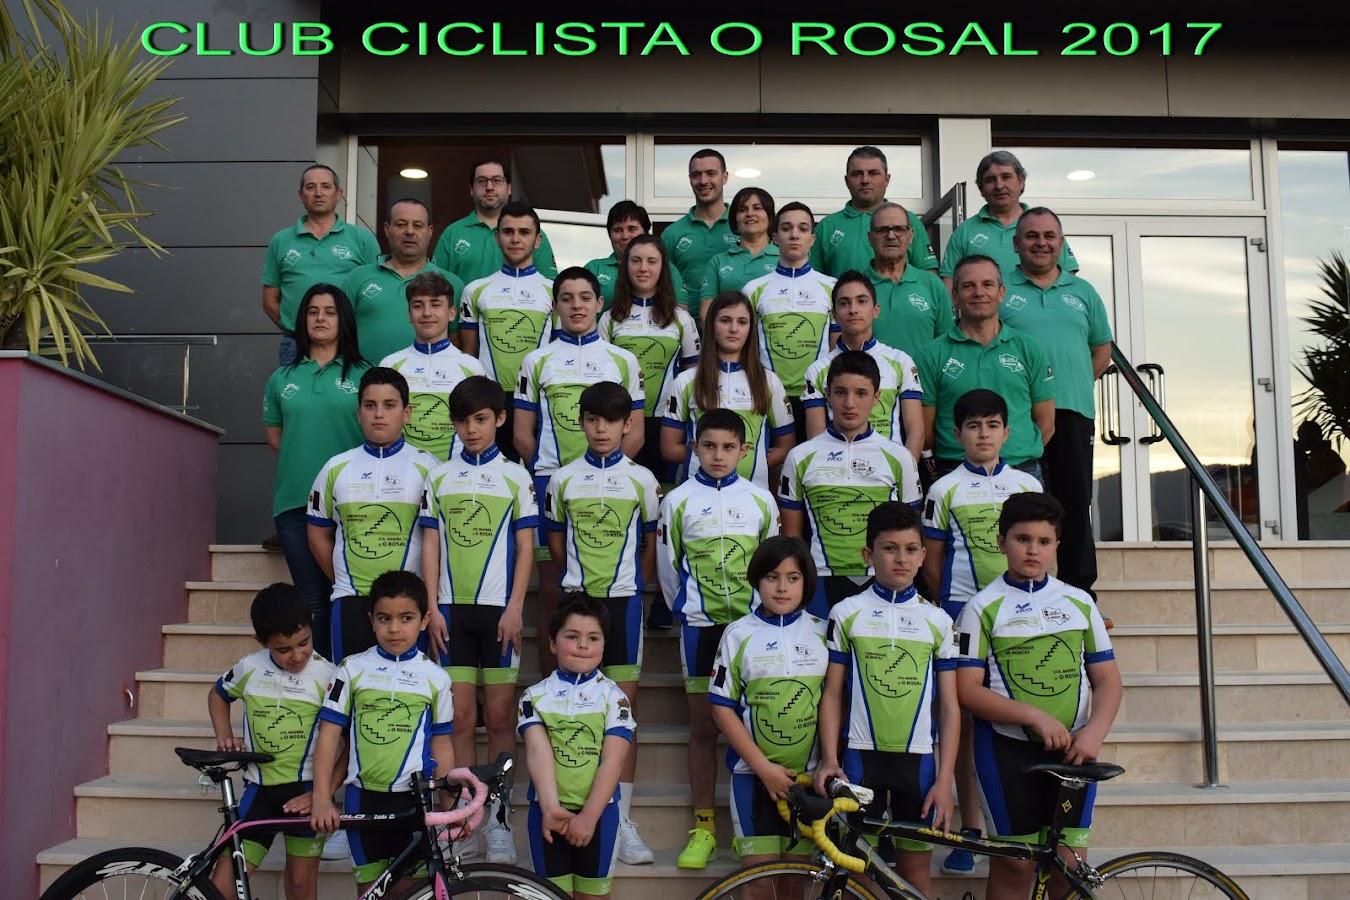 C.C. O ROSAL